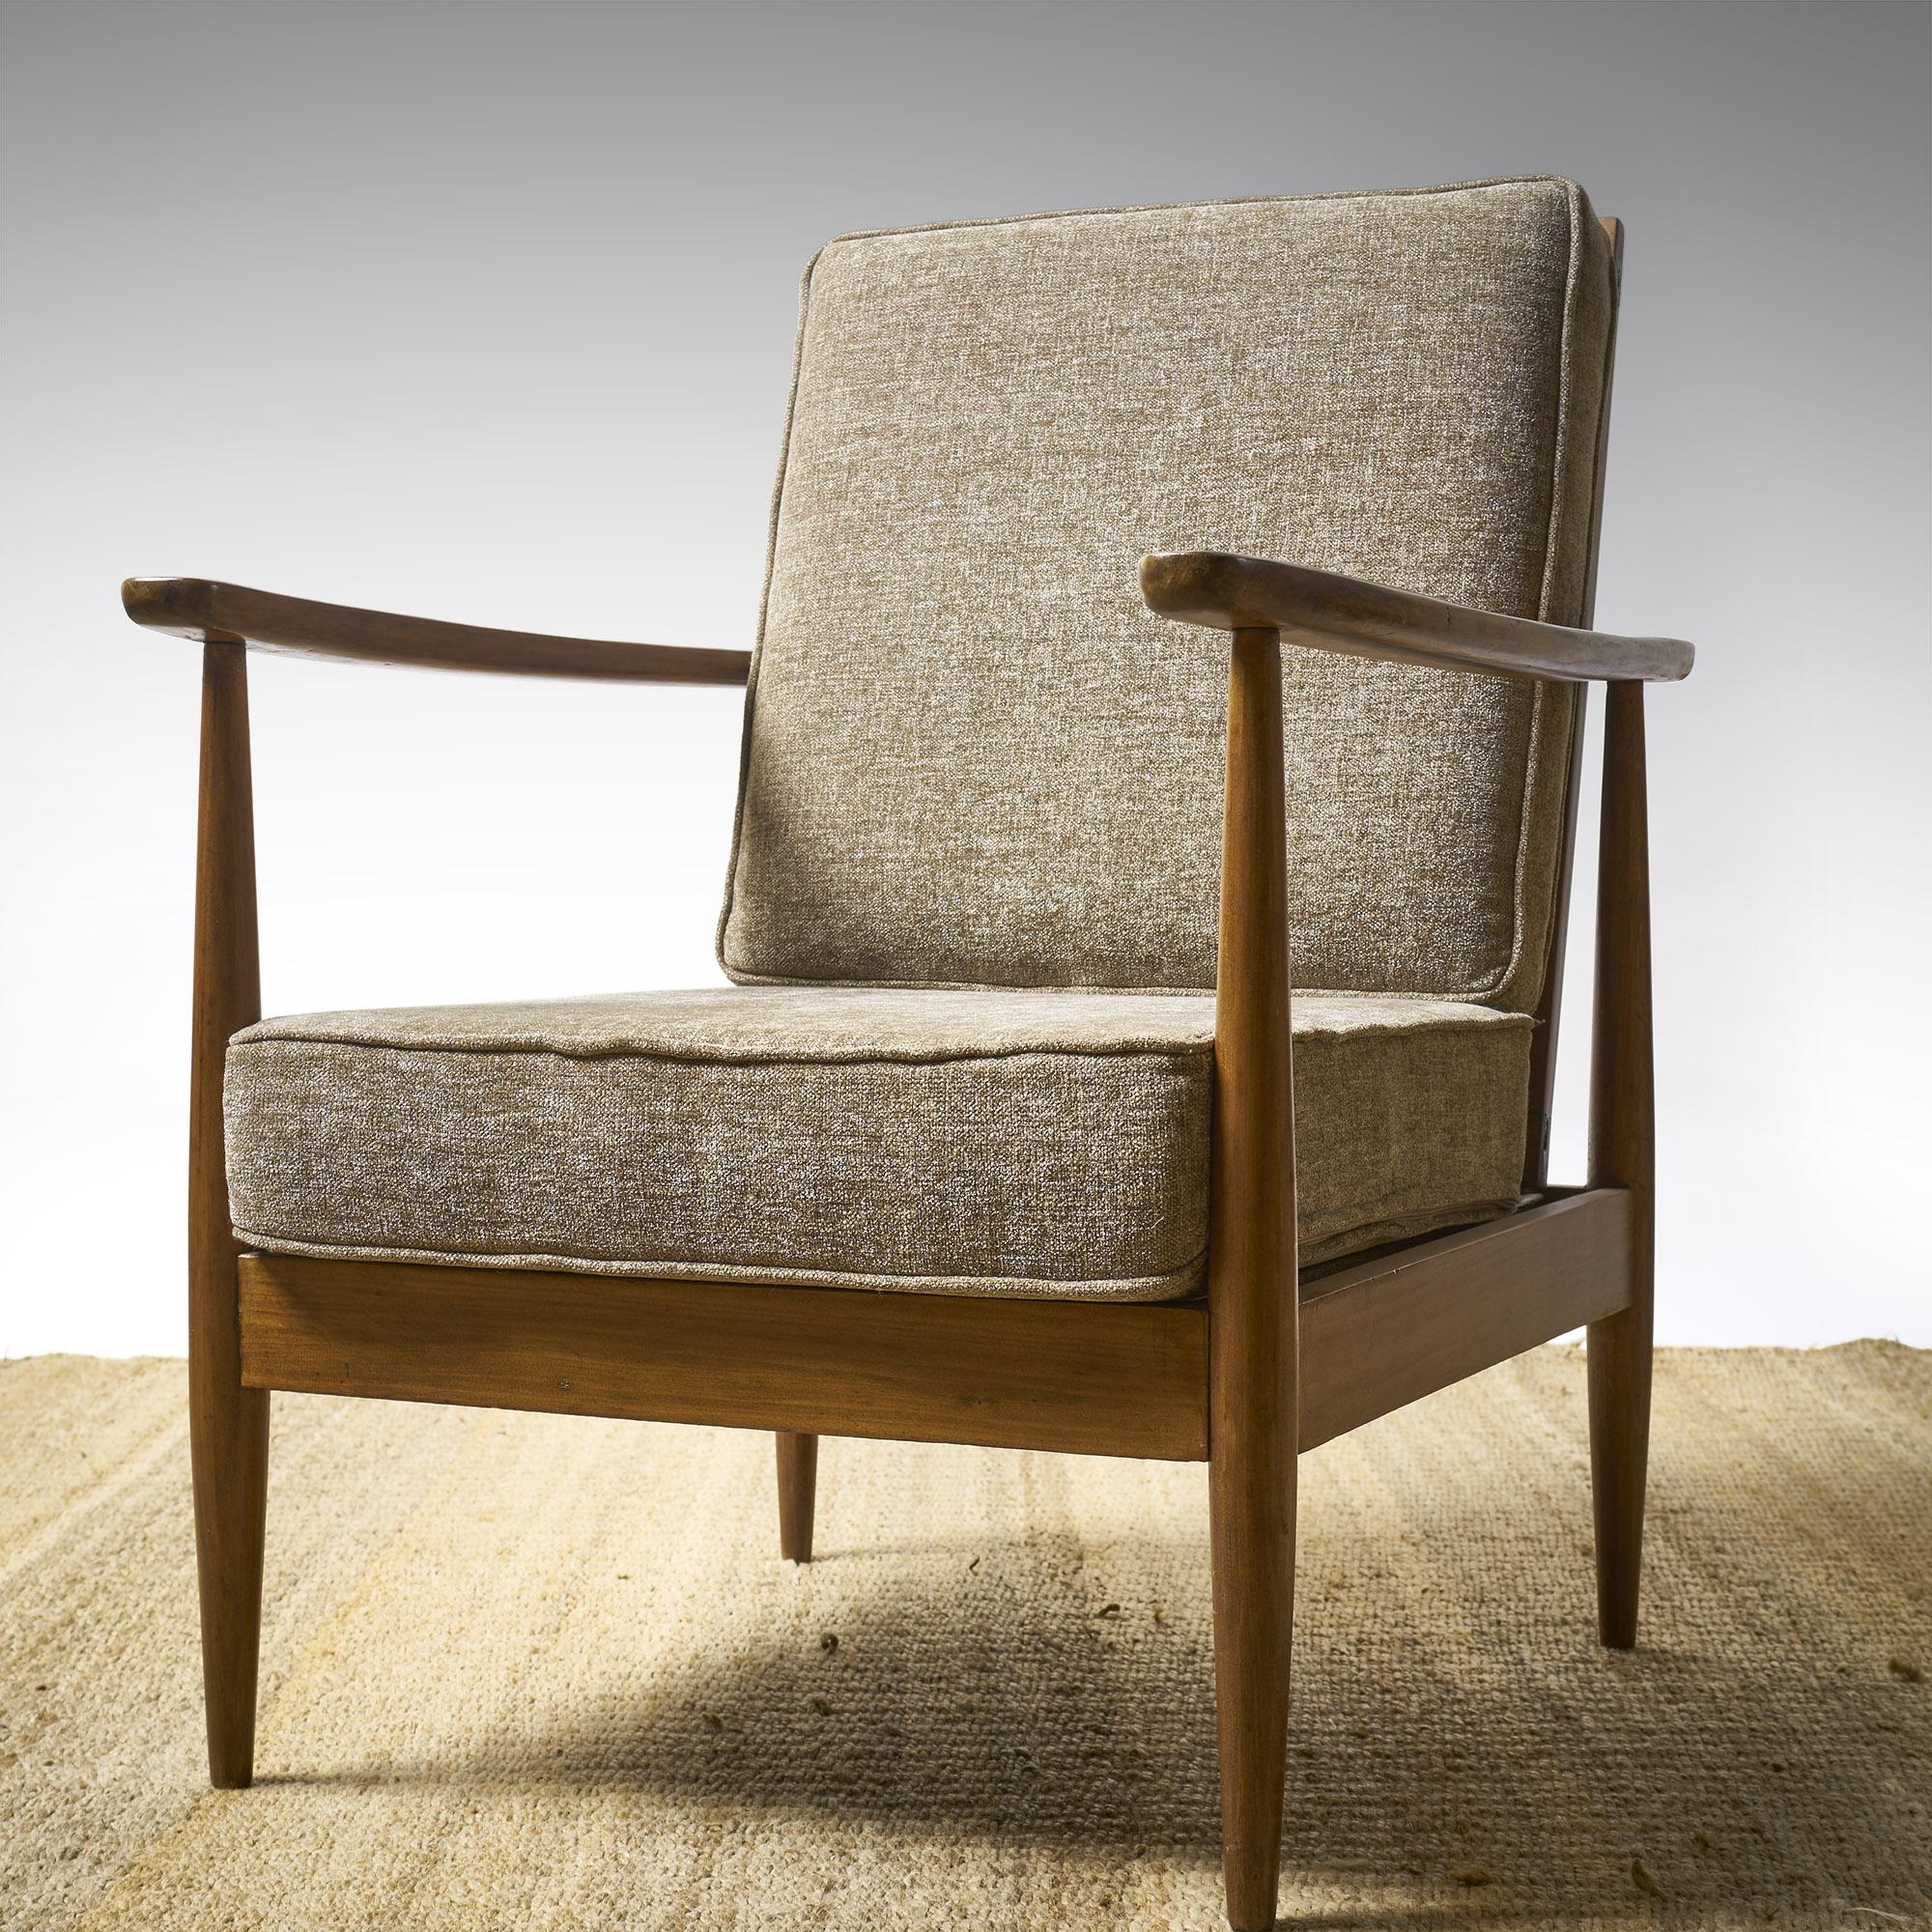 Par de sillones daneses respaldo reclinable.